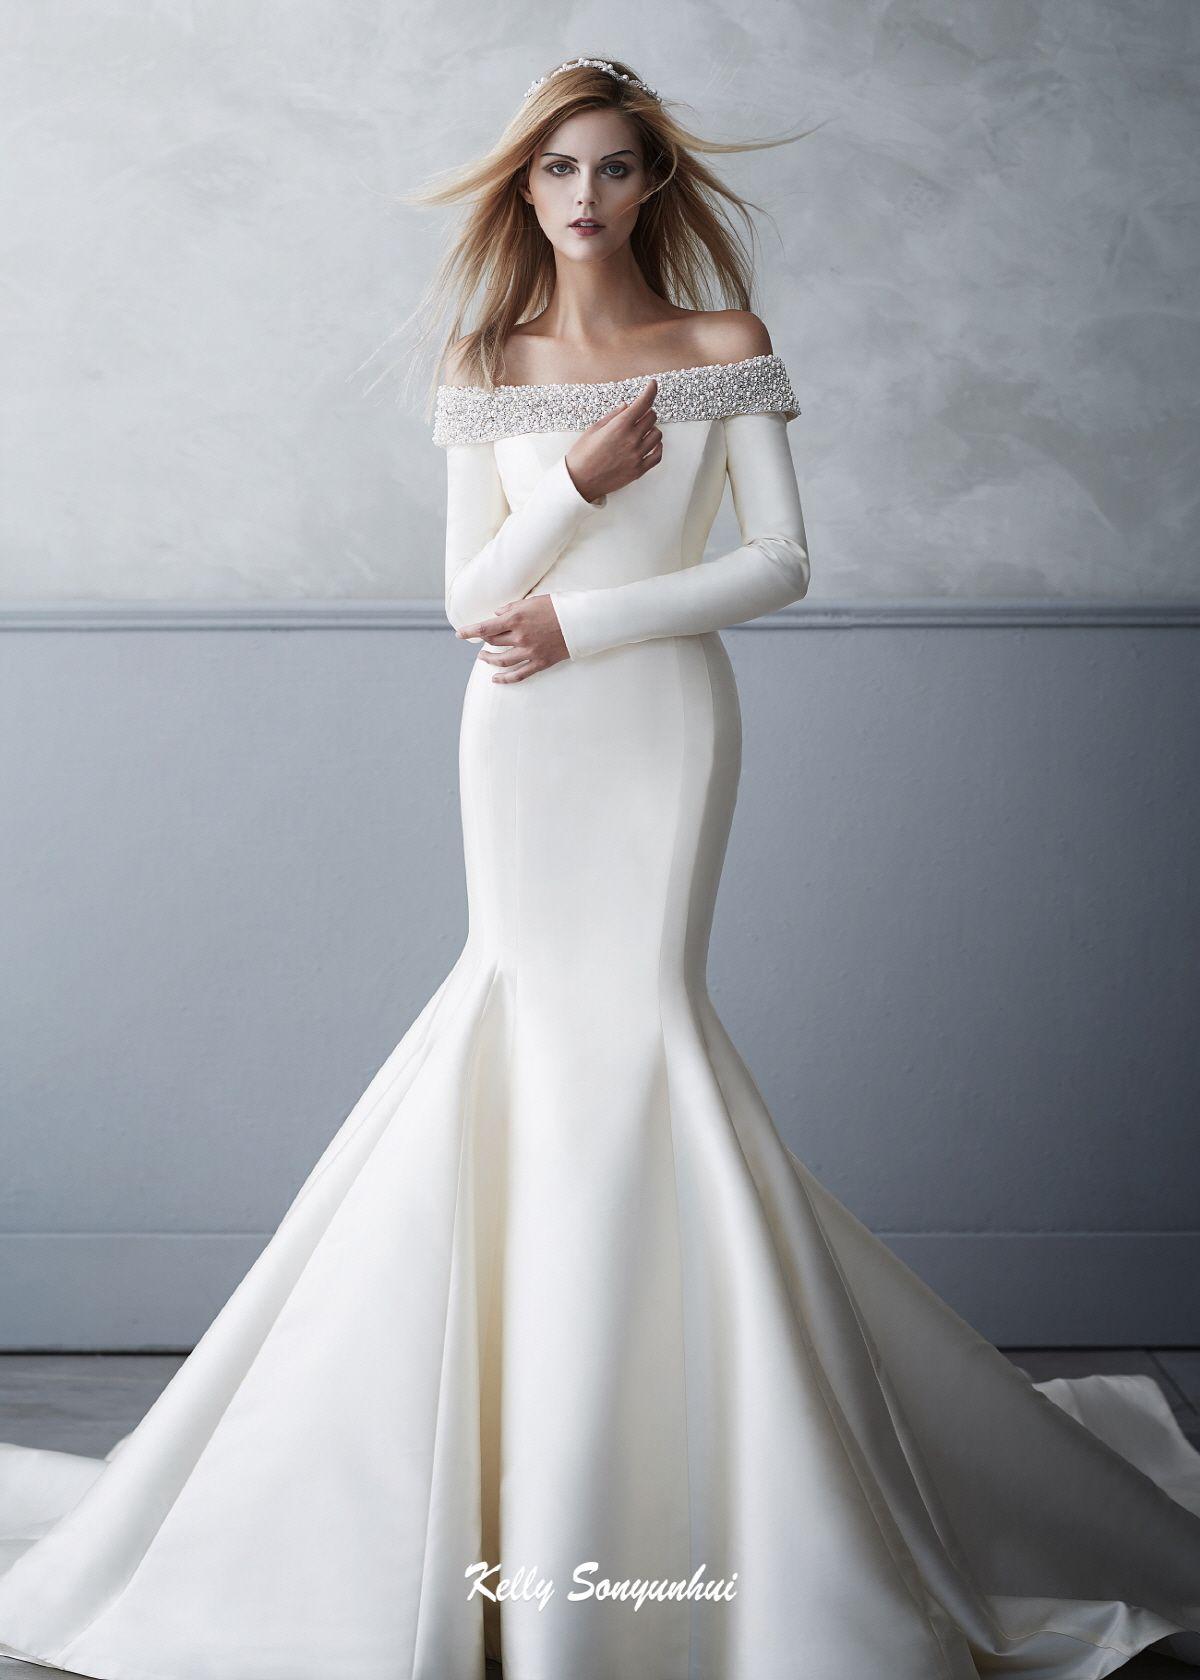 Kelly Sonyunhui €� Bridal Dresses Wedding With Bling Elegant Dress: Silk Mermaid Wedding Dress Sleeves At Reisefeber.org